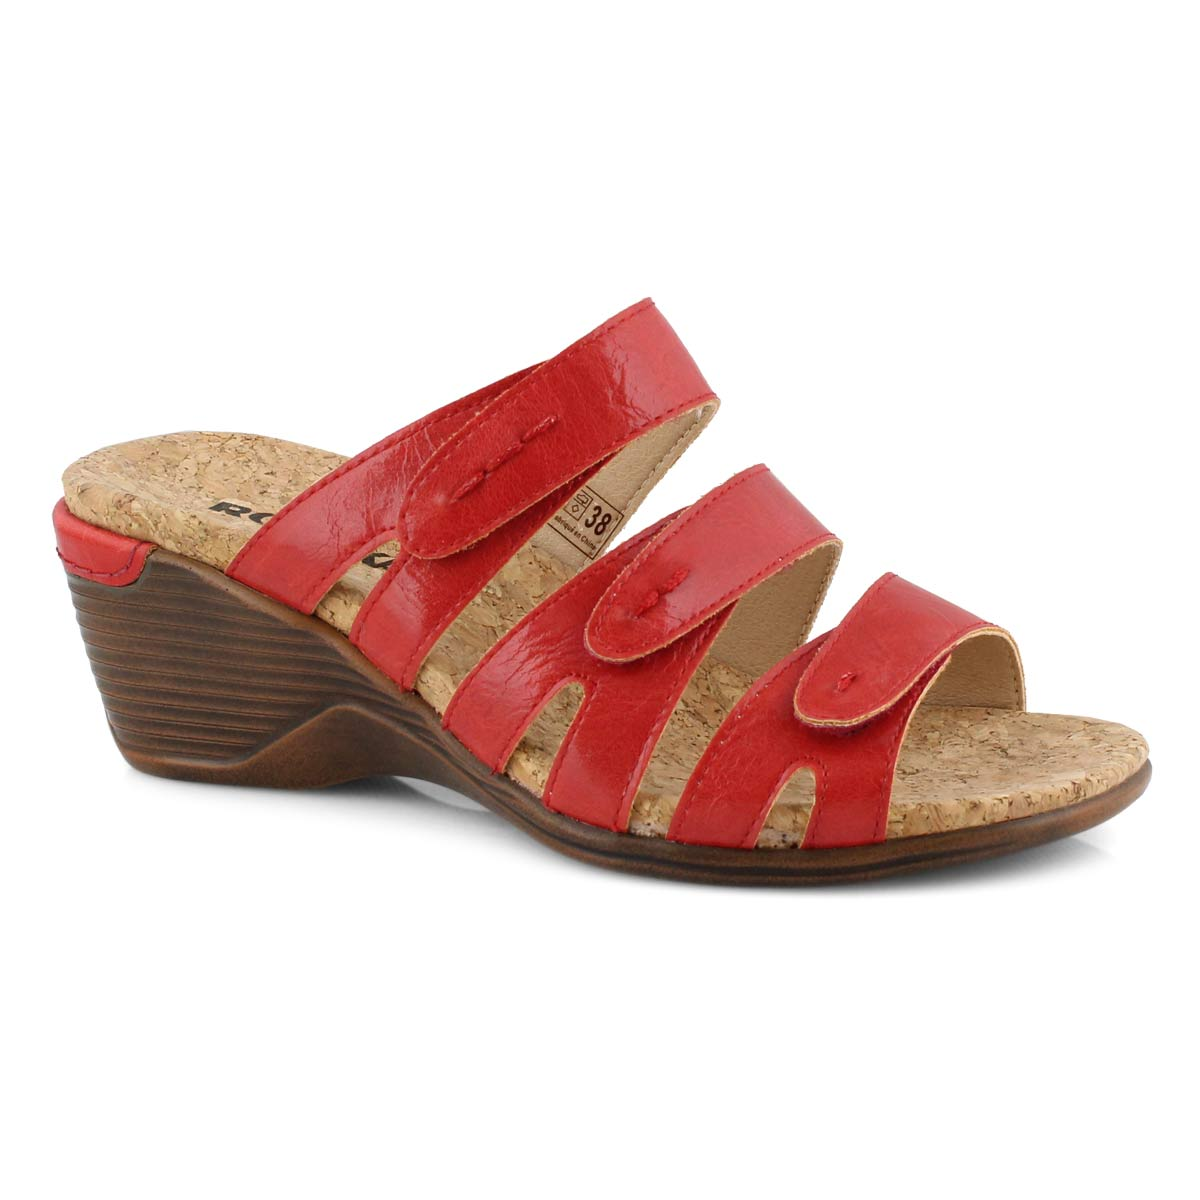 Lds Calgary 01 red wedge sandal